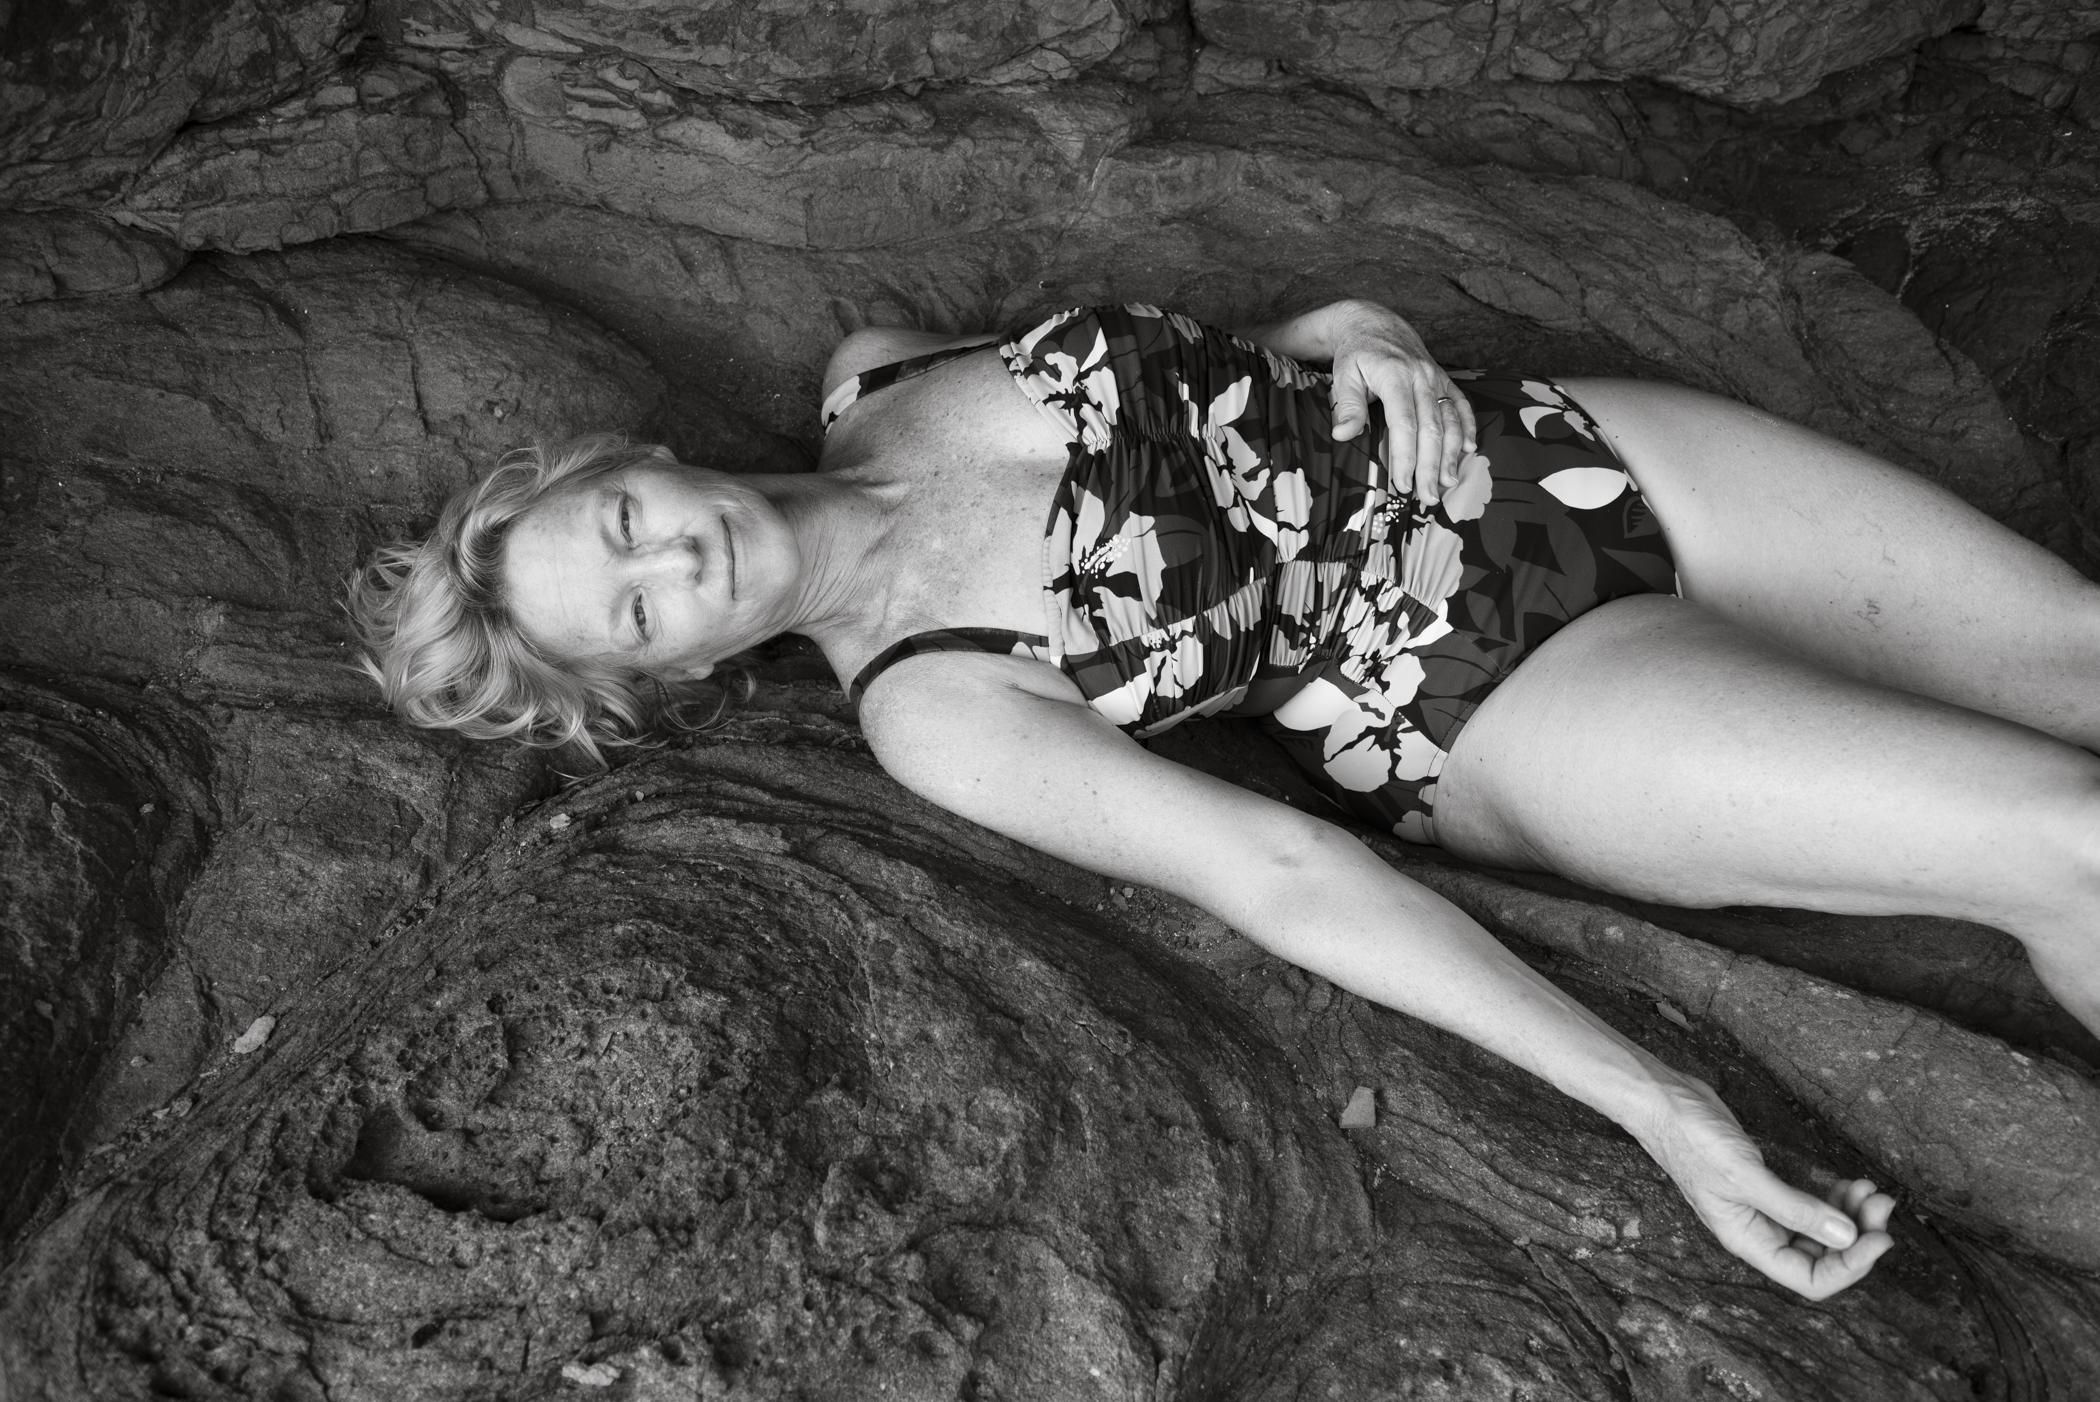 012014-Culebra-JuliaLuckettPhotography-168